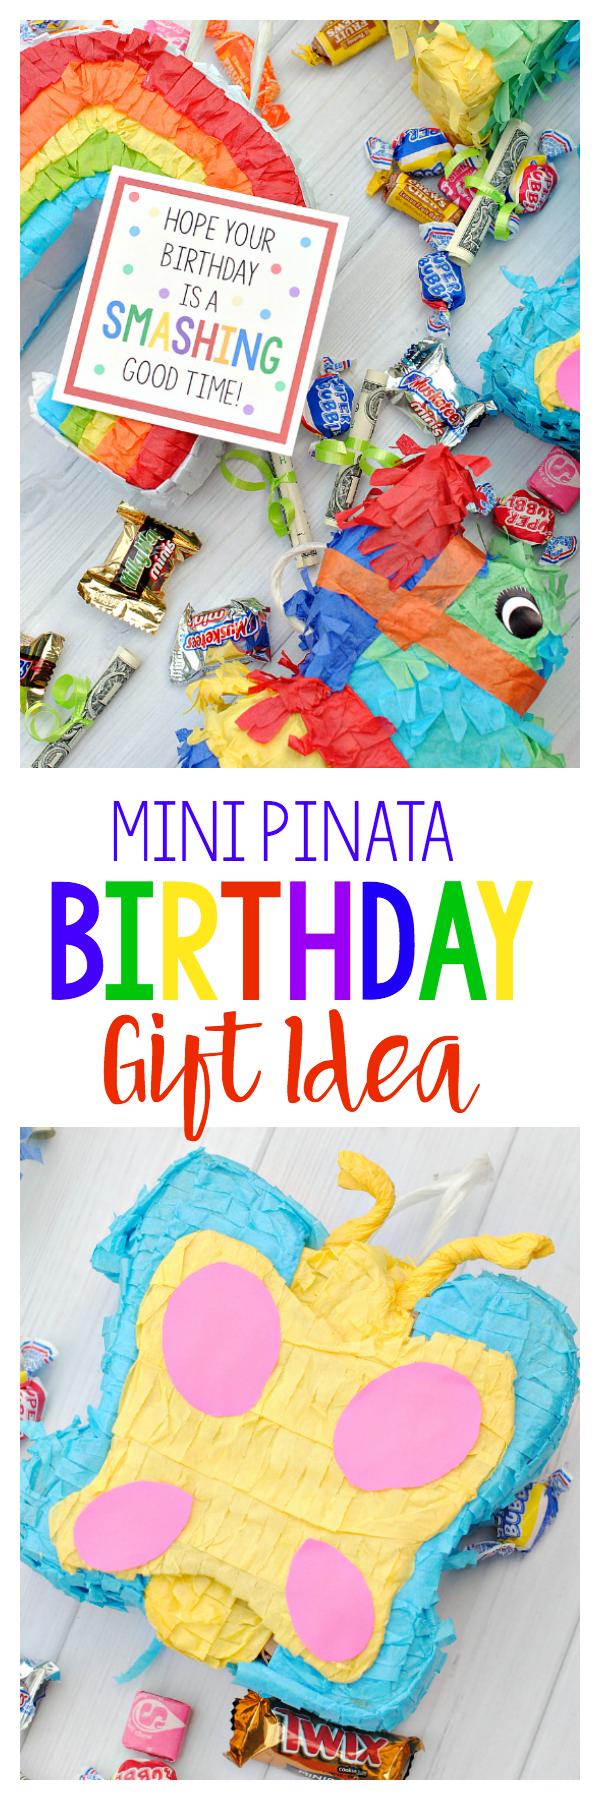 Creative Birthday Gift Idea with Mini Piñatas